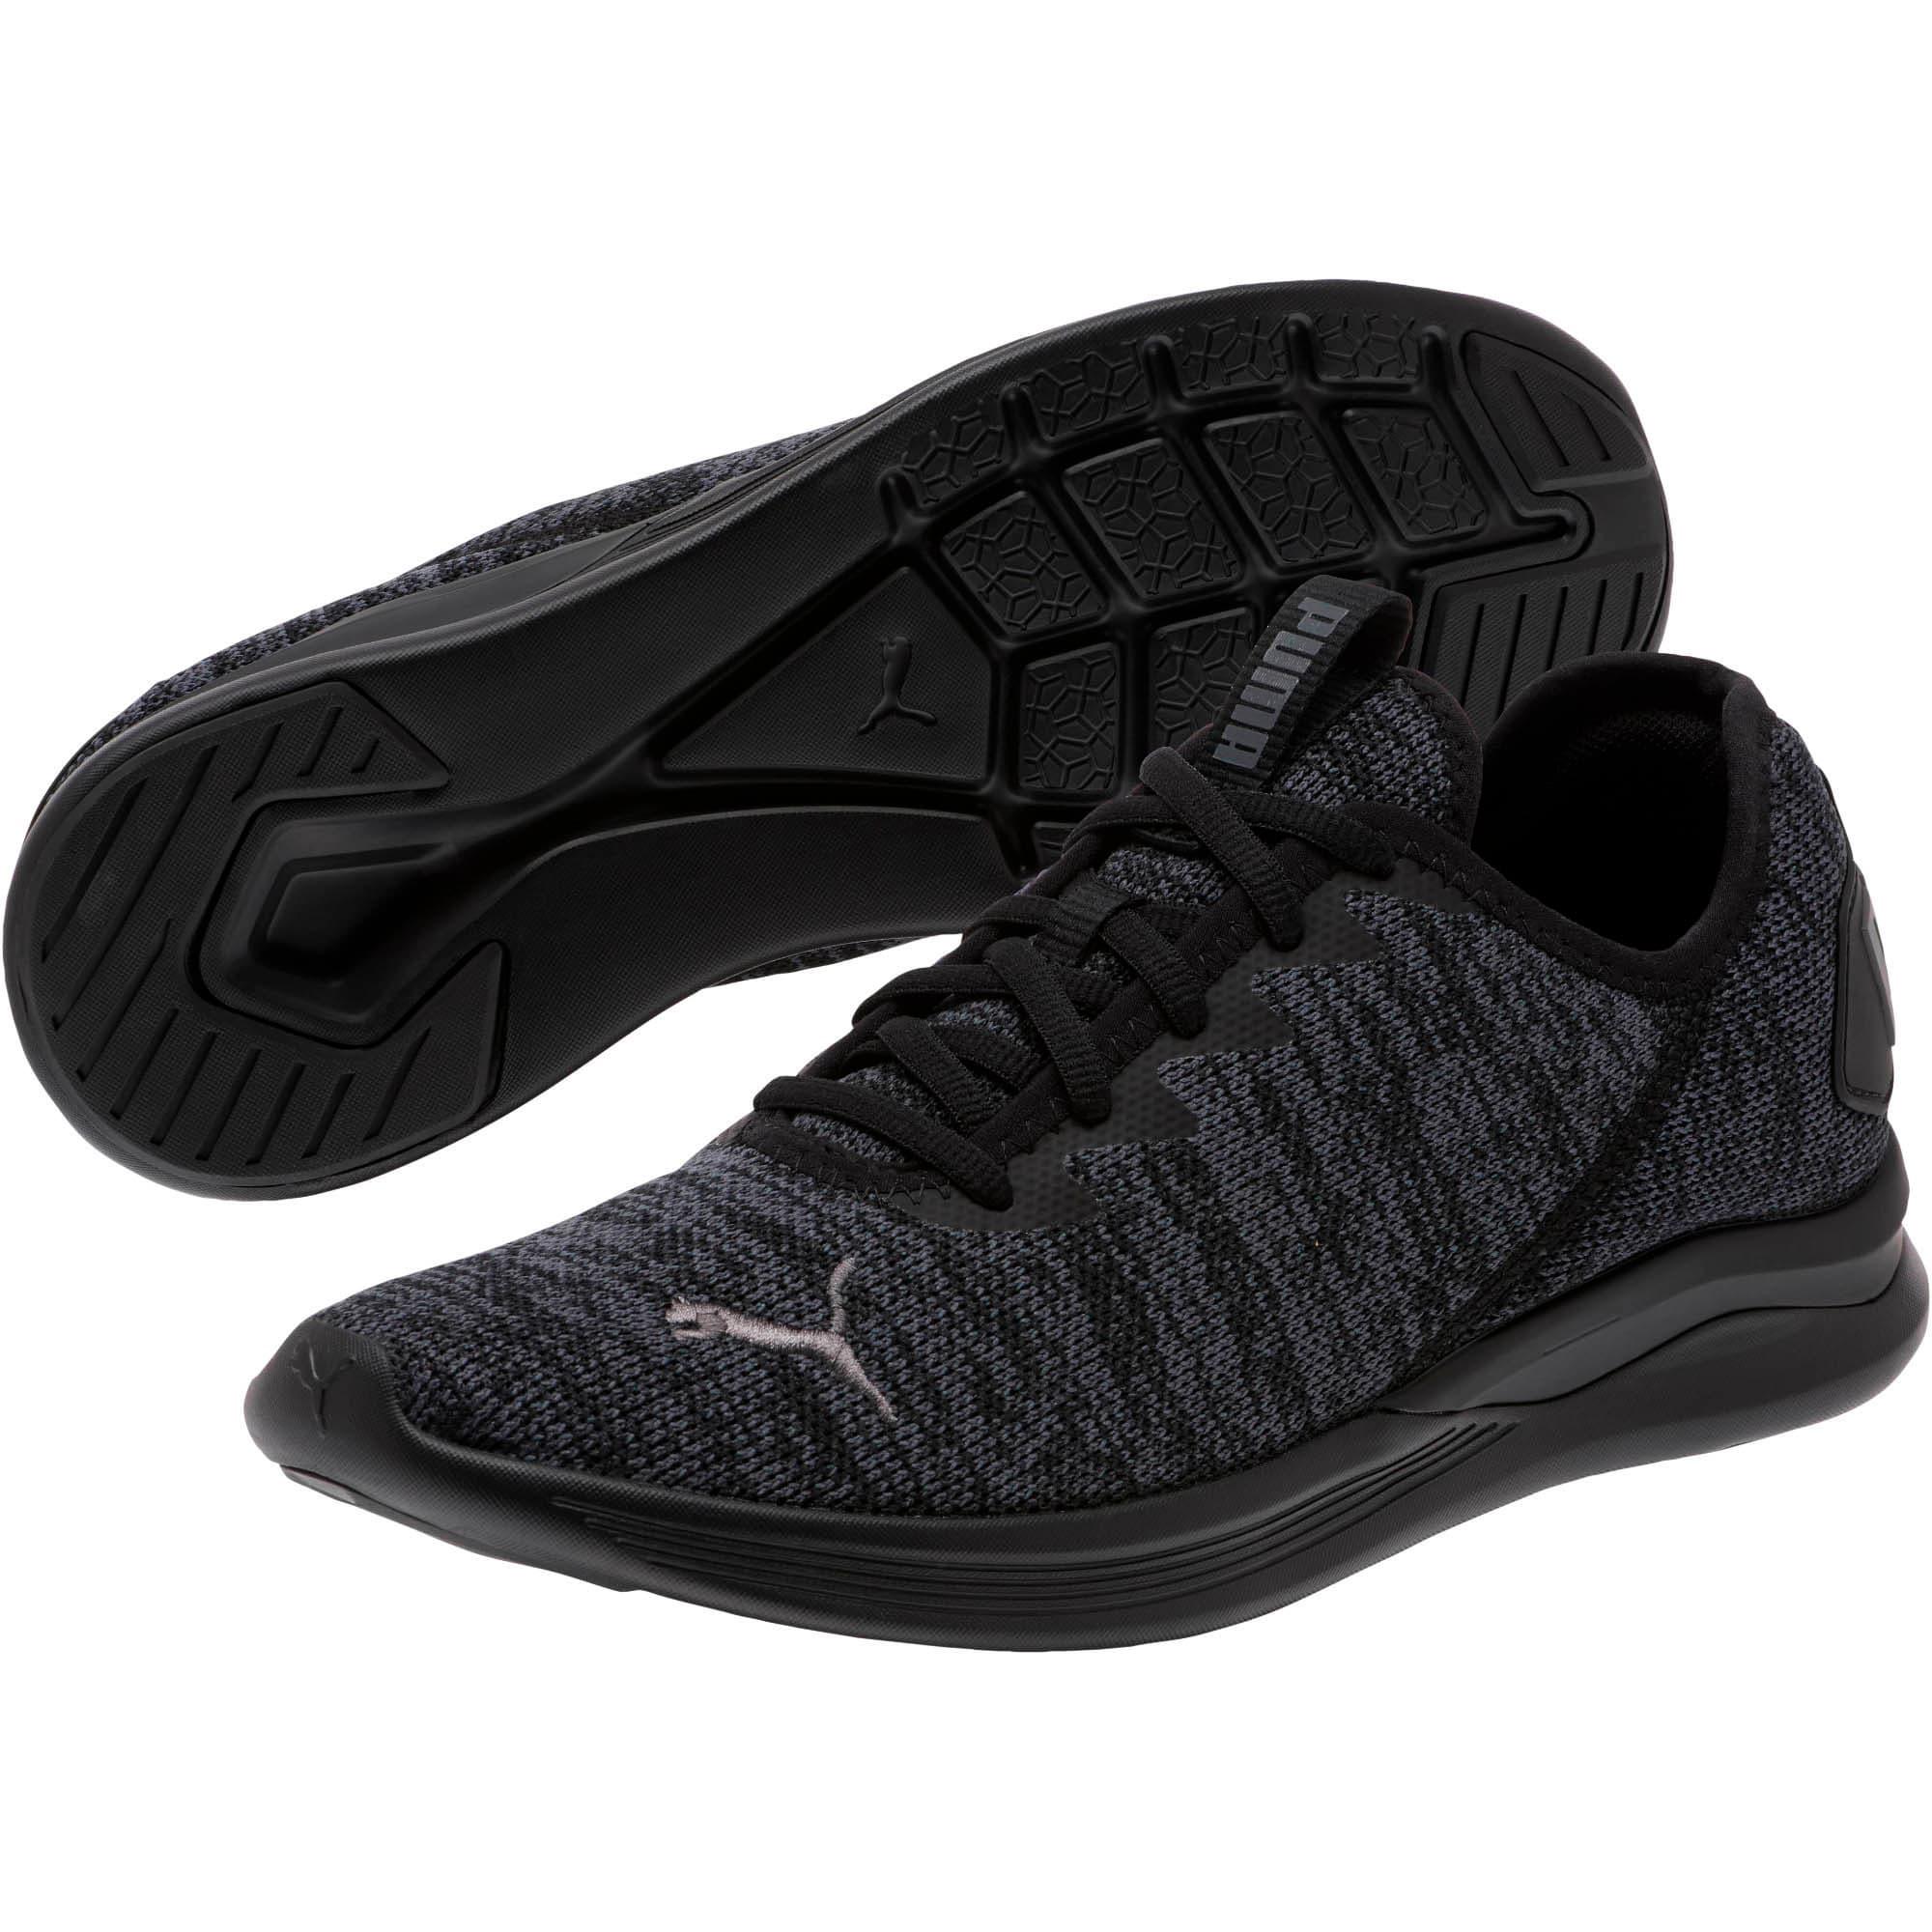 Thumbnail 2 of Ballast Men's Running Shoes, Puma Black-Iron Gate, medium